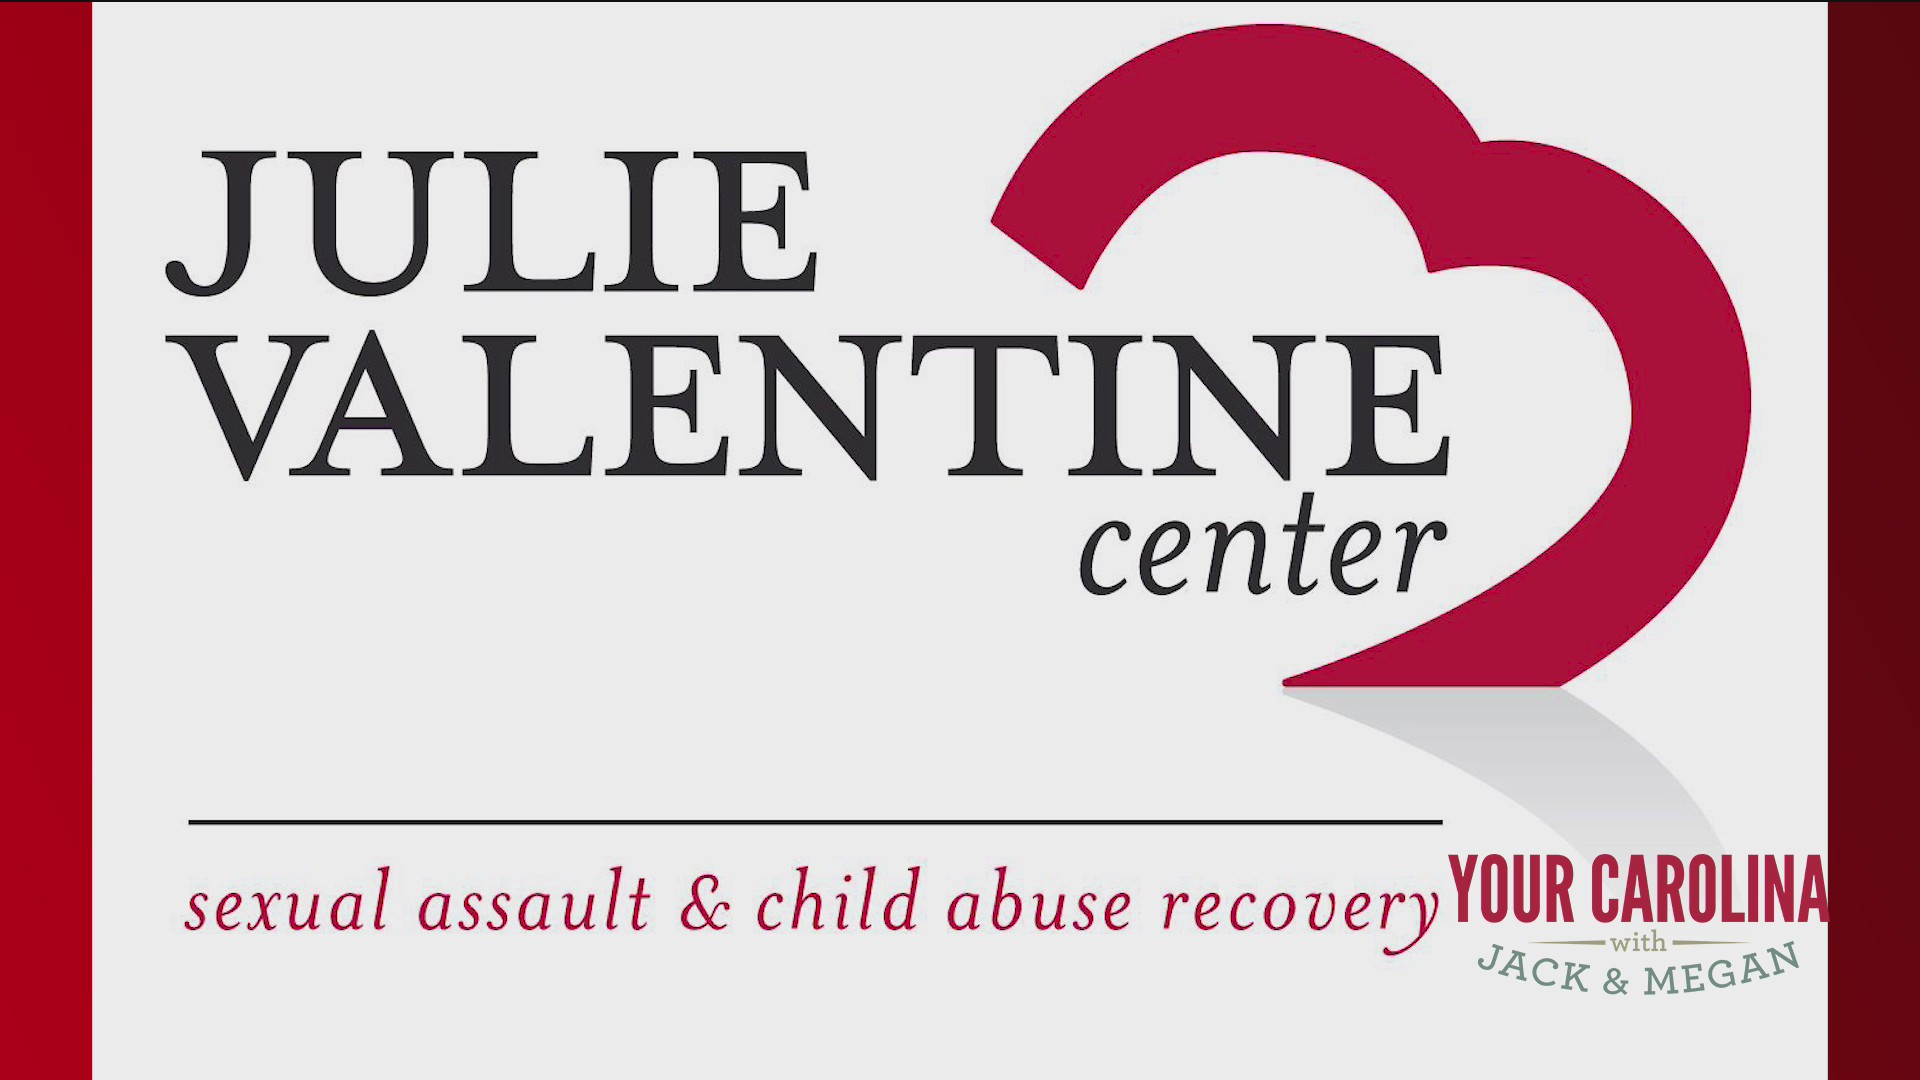 Caring for the Carolinas - Julie Valentine Center